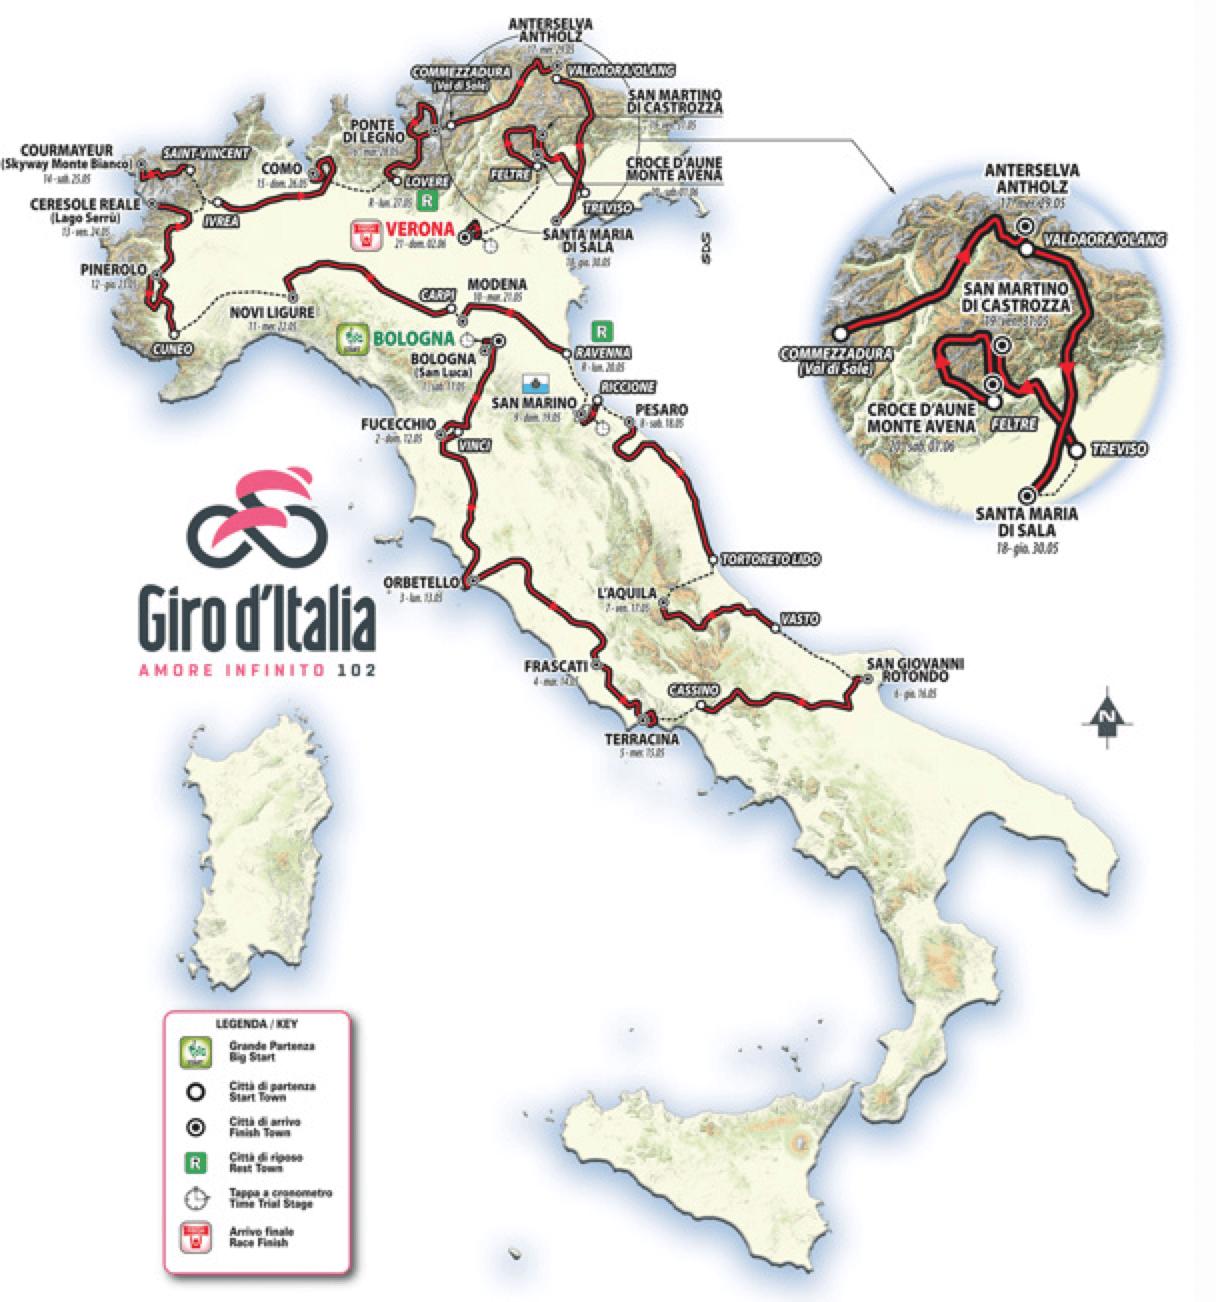 Giro d'Italia Map 2019